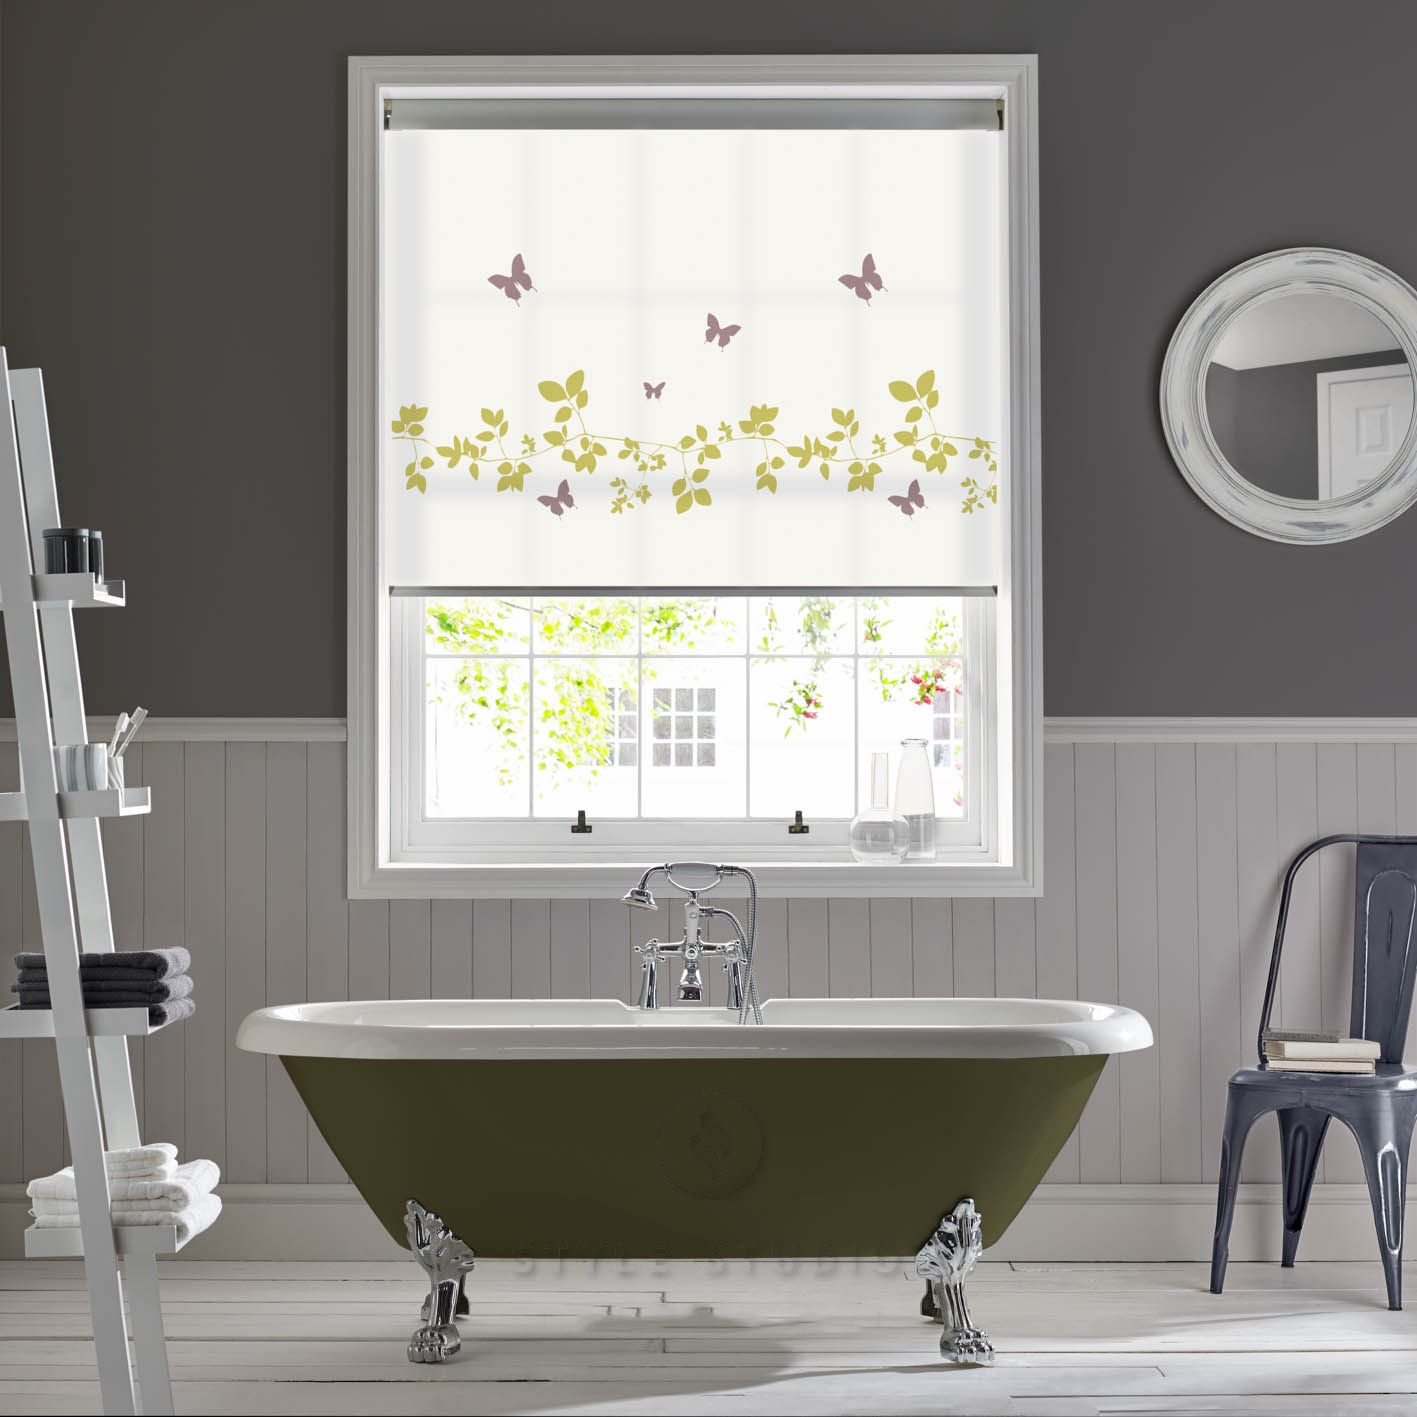 Window blinds bathroom - Senses Roller Blinds Vine And Butterfly